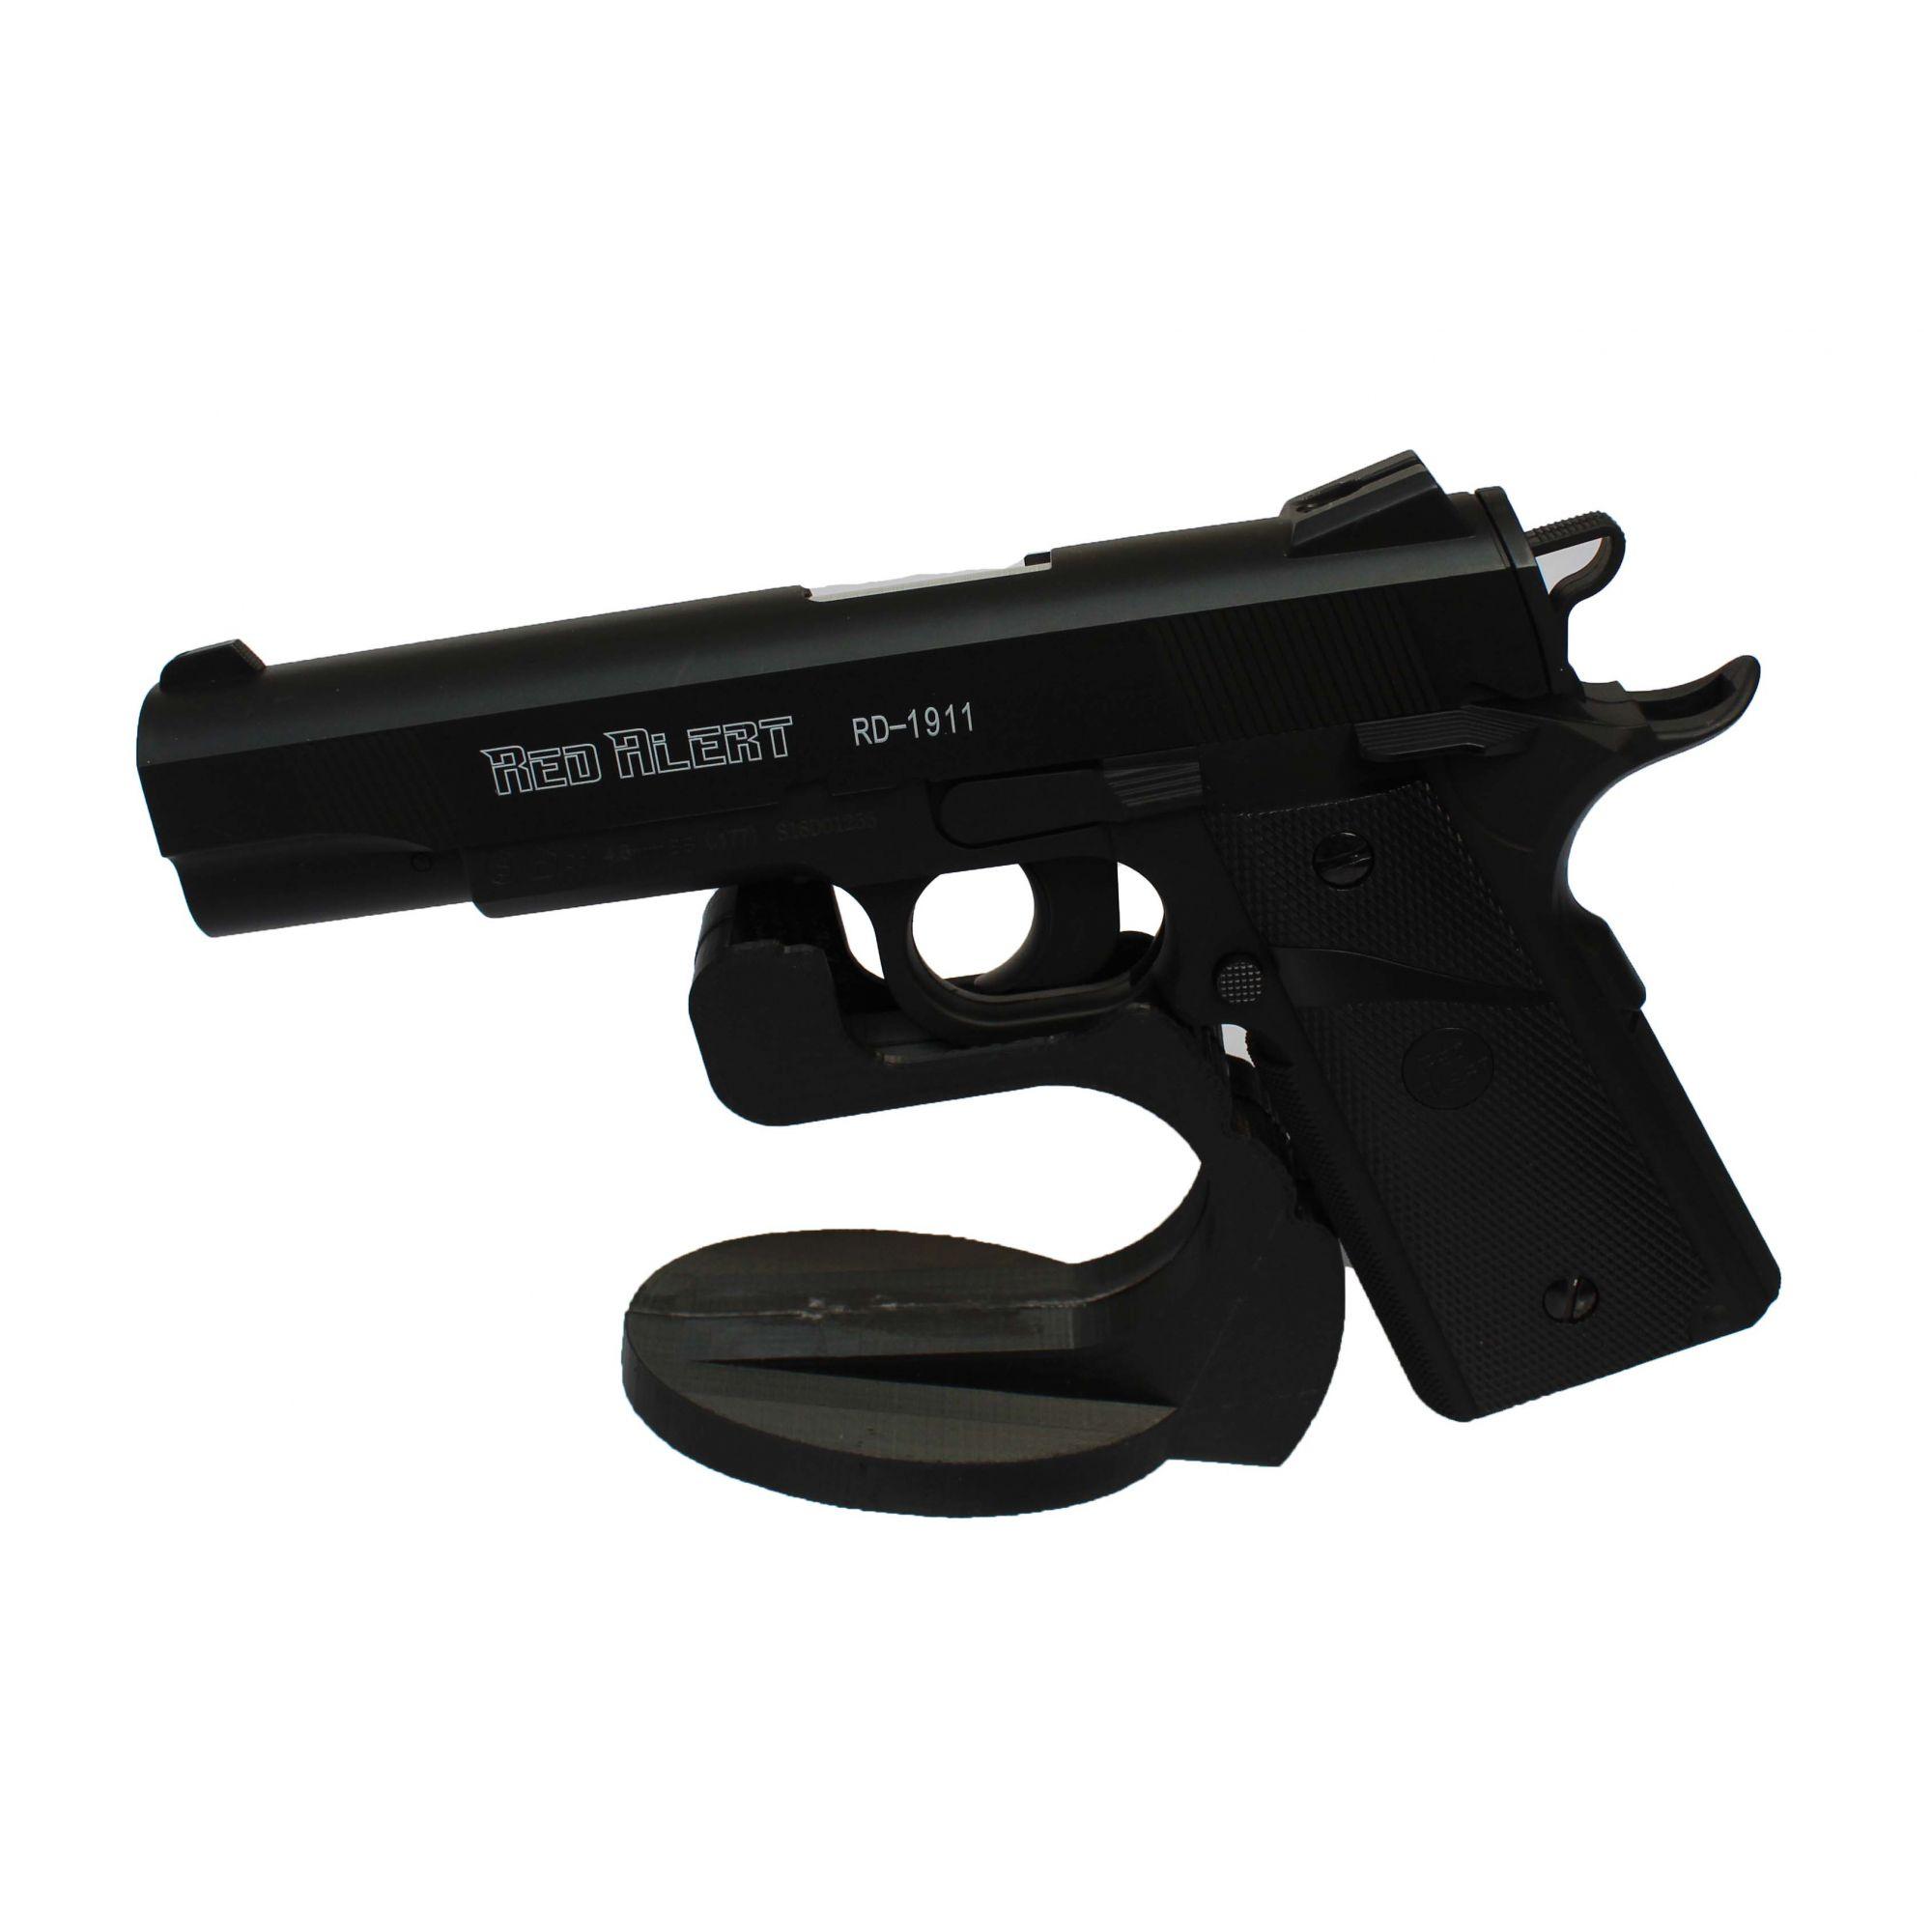 Pistola de Pressão Red Alert 1911 4,5 mm